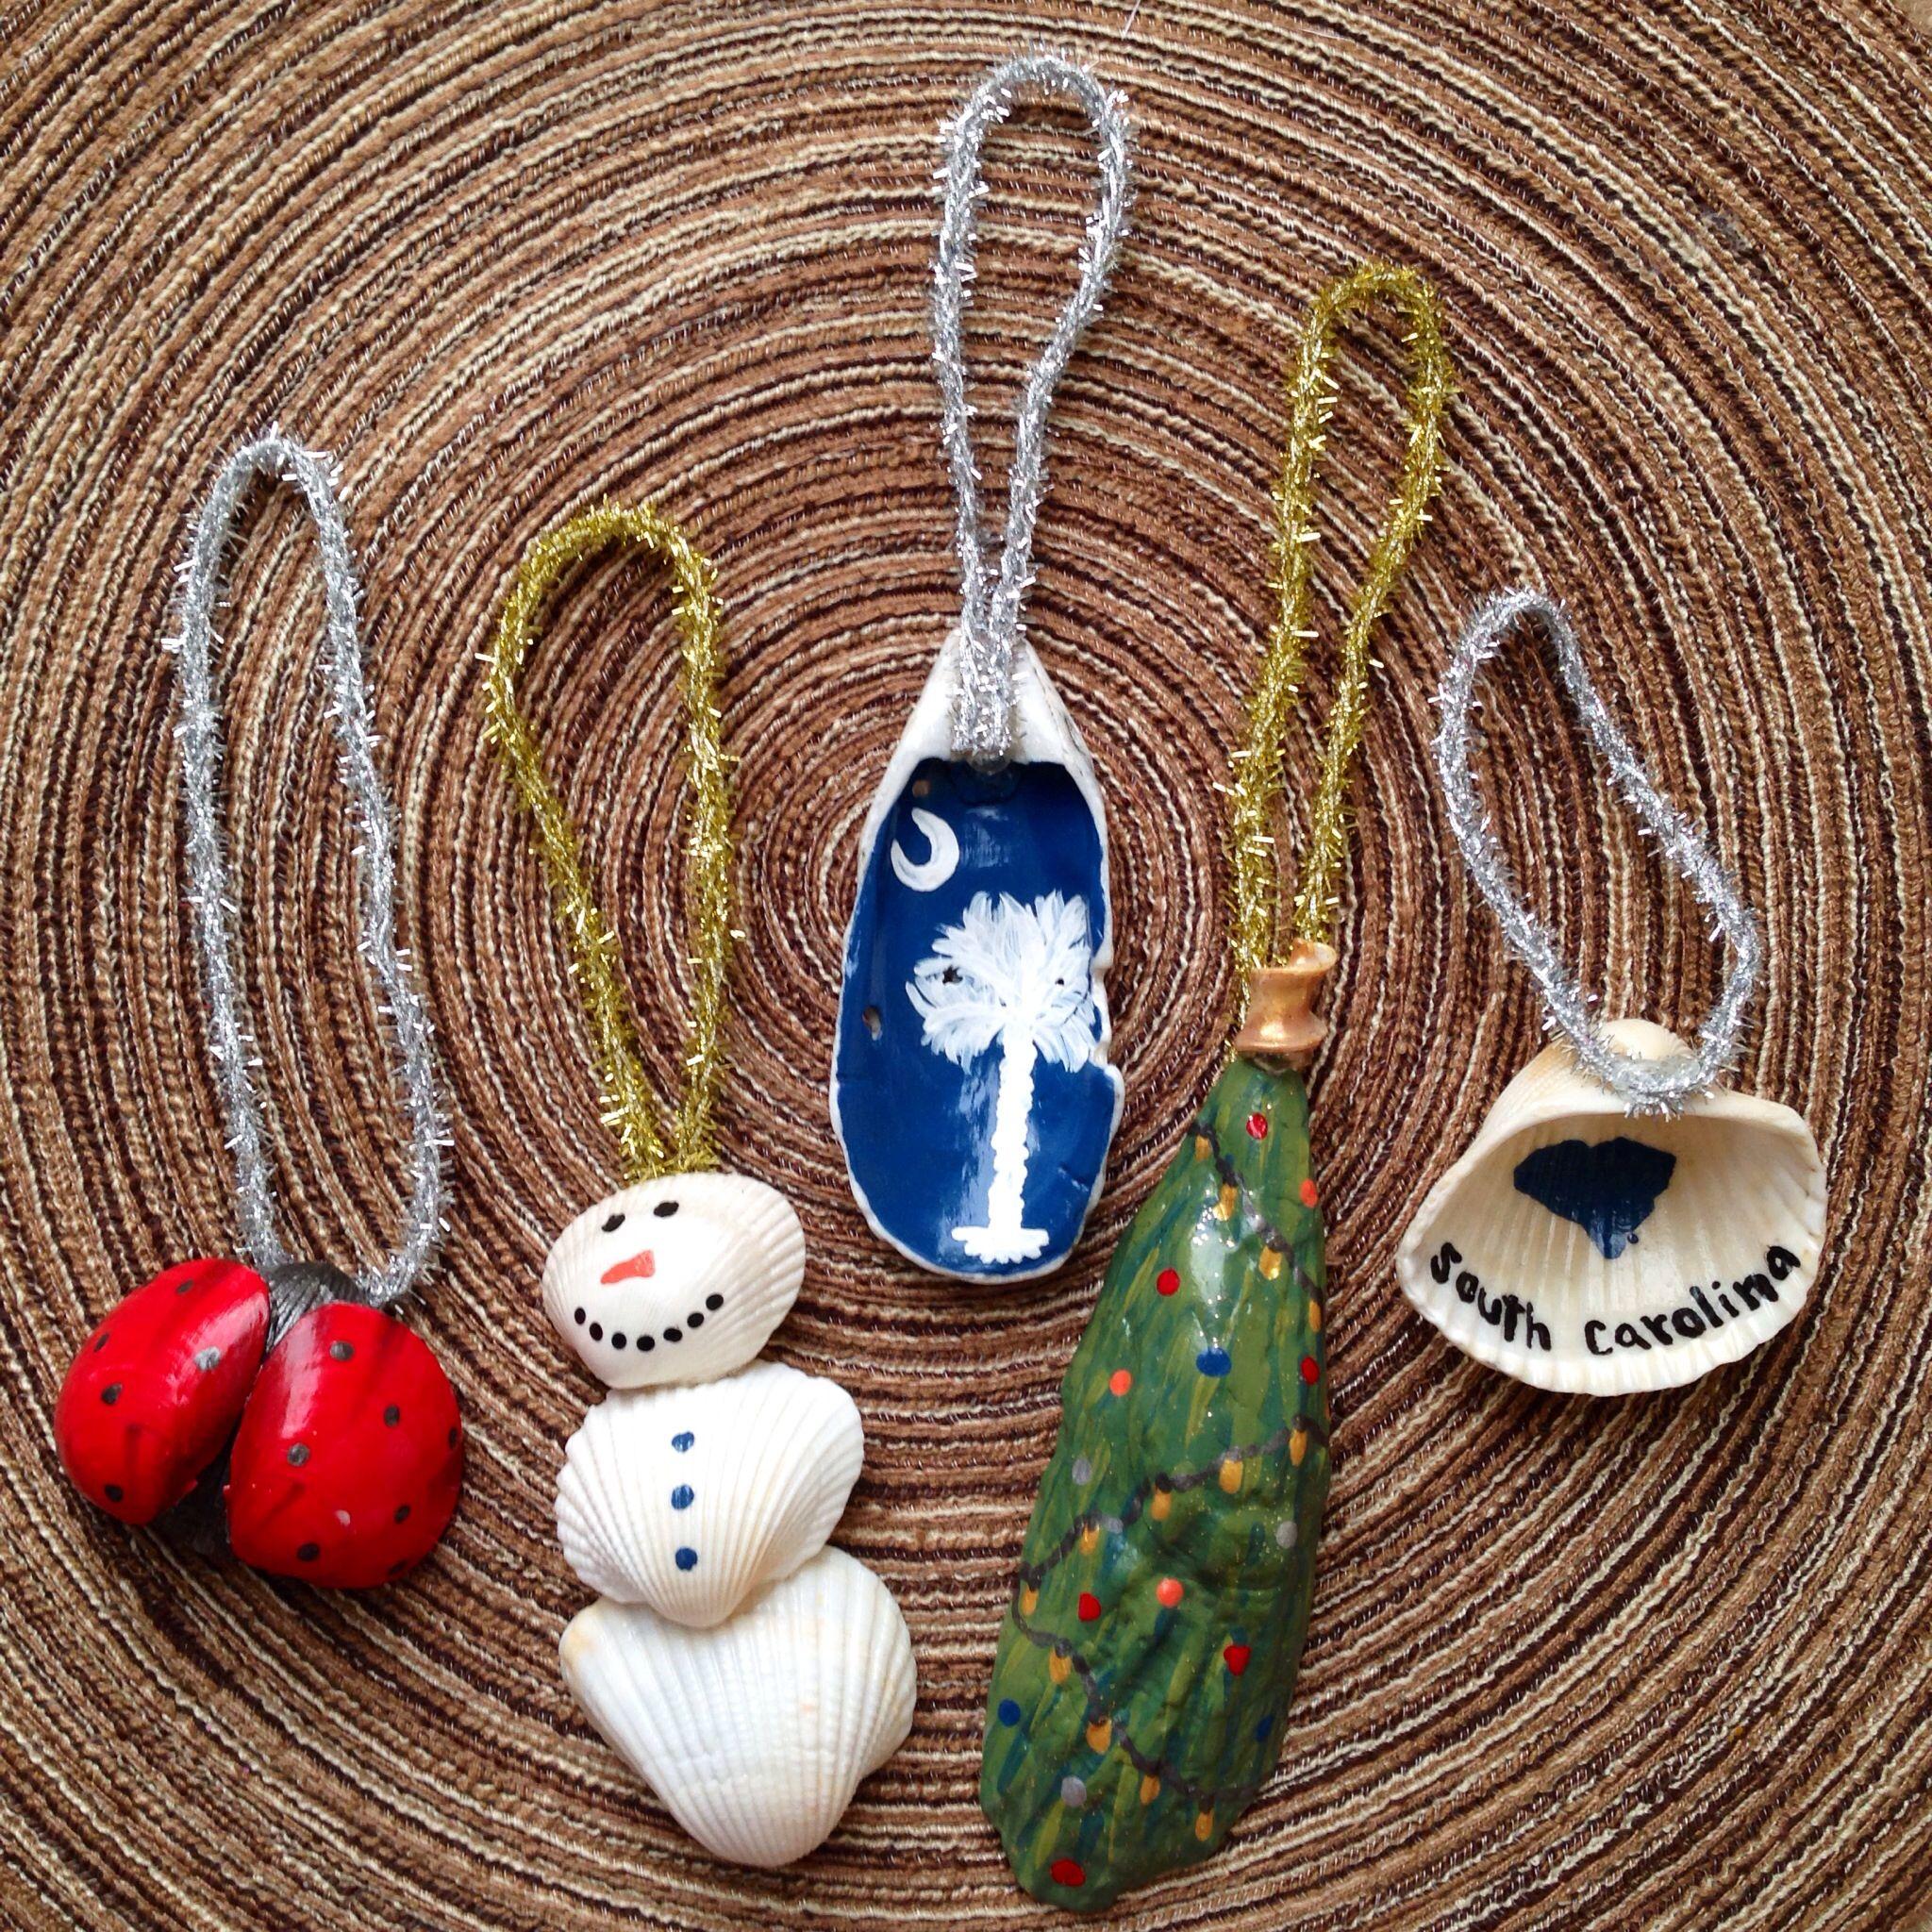 Seashell christmas ornaments craft ideas pinterest for Seashell ornaments craft